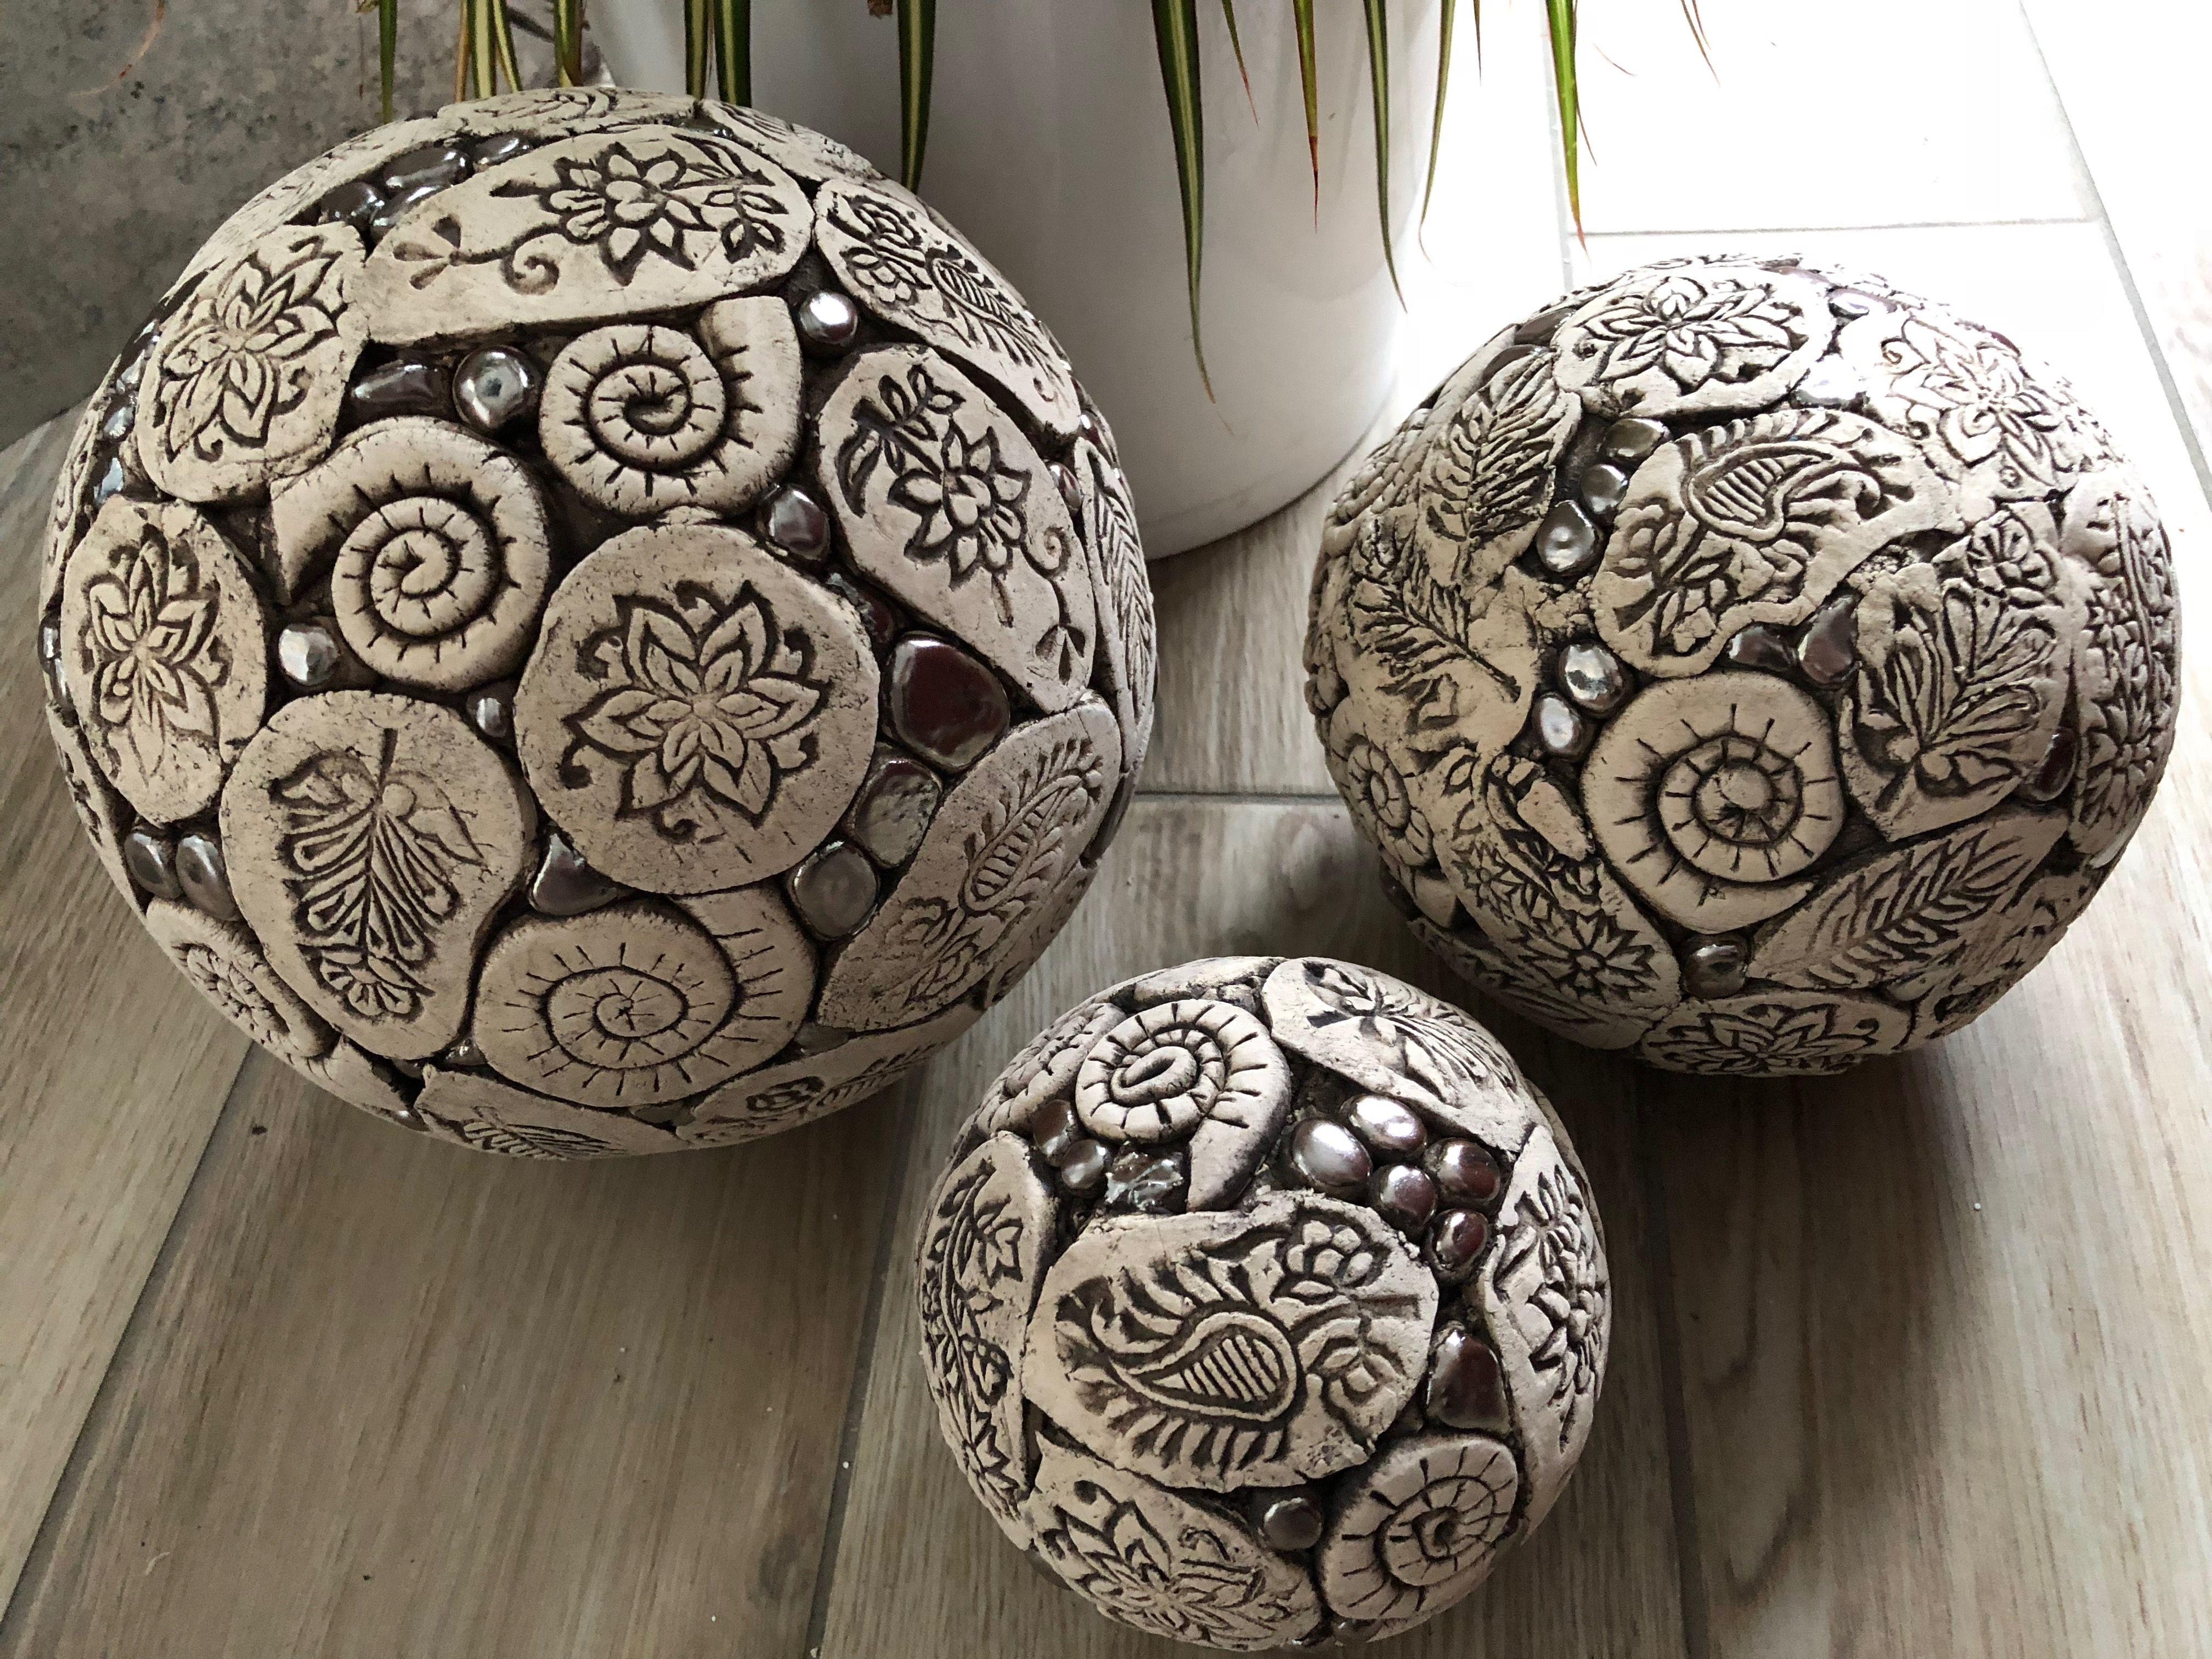 keramik dekokugeln f r garten keramik in 2019 keramik. Black Bedroom Furniture Sets. Home Design Ideas